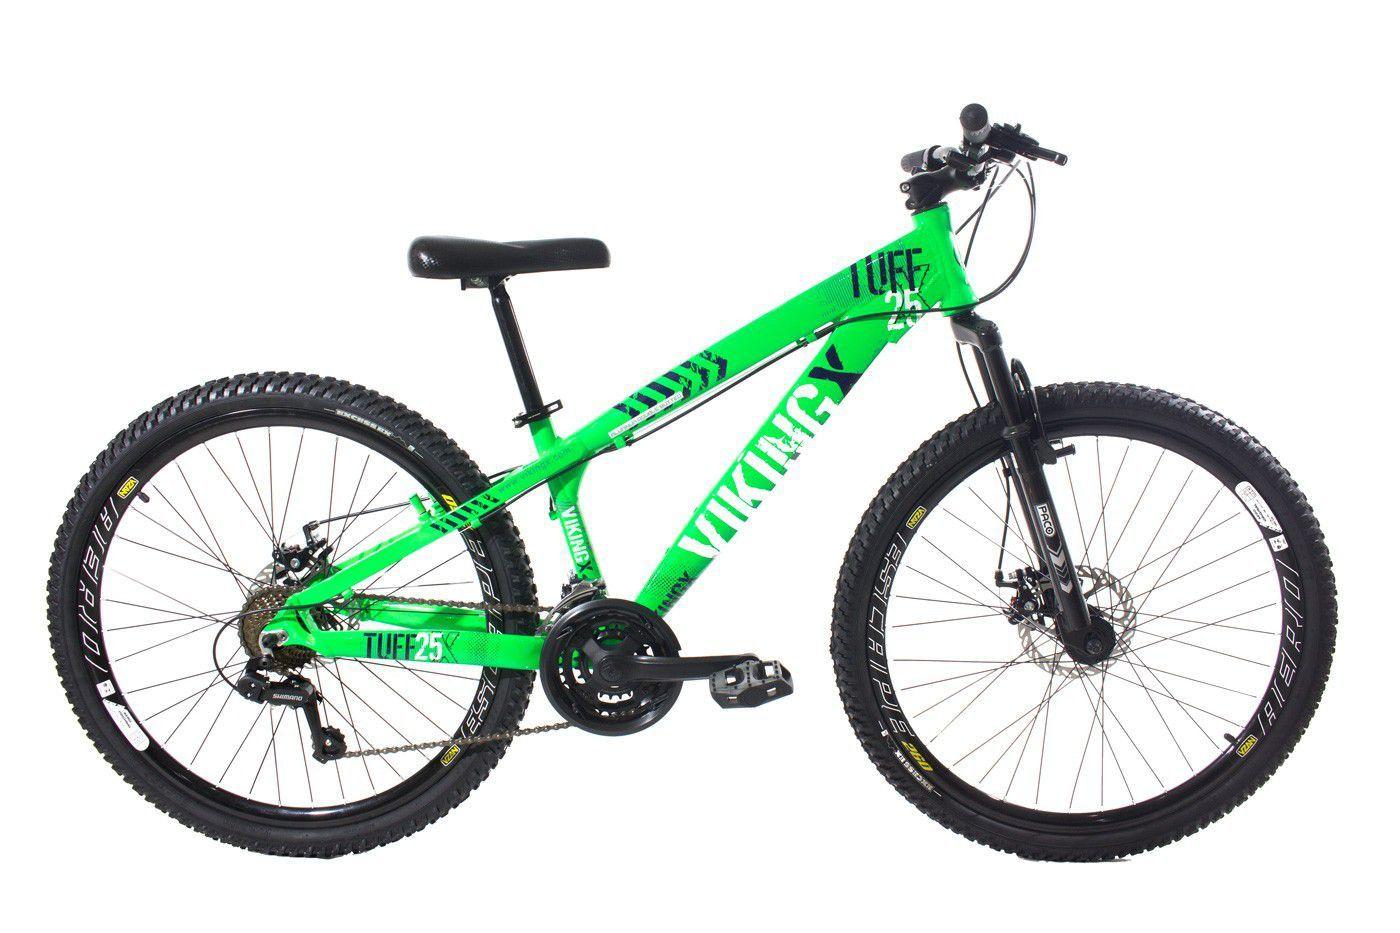 Bicicleta Vikingx Tuff Freeride Freio V-brake Roxo/Mostarda VD Neon